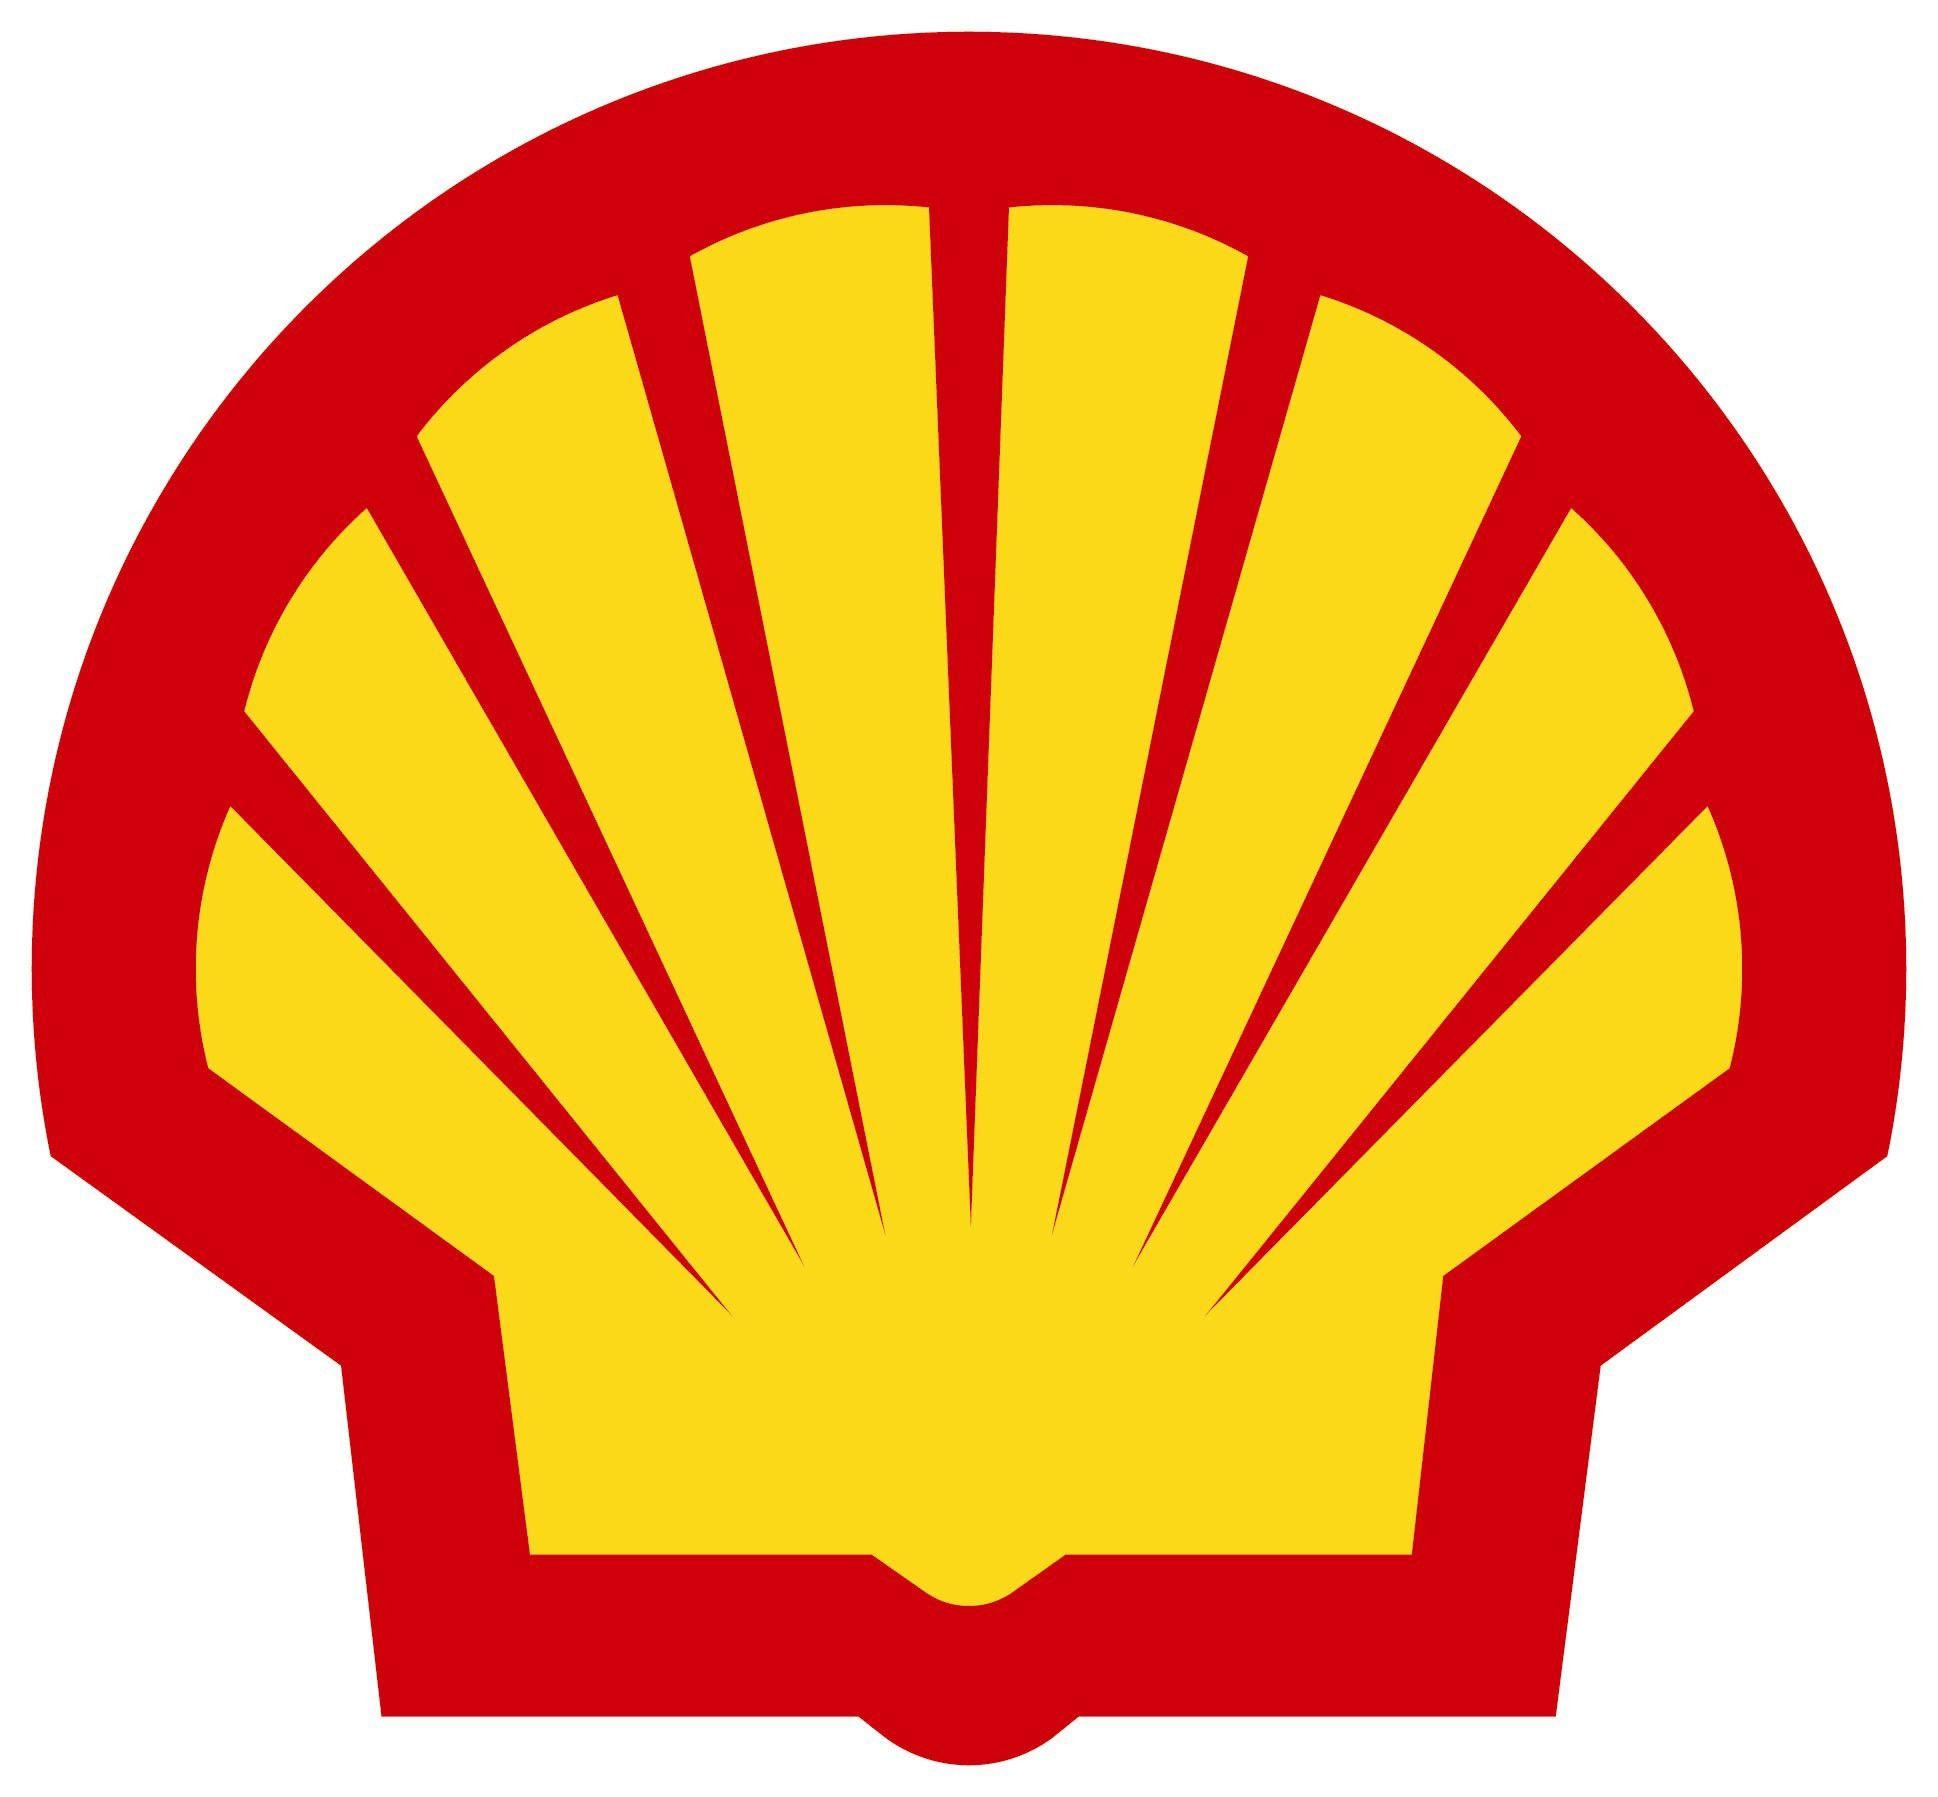 shell.jpg - large